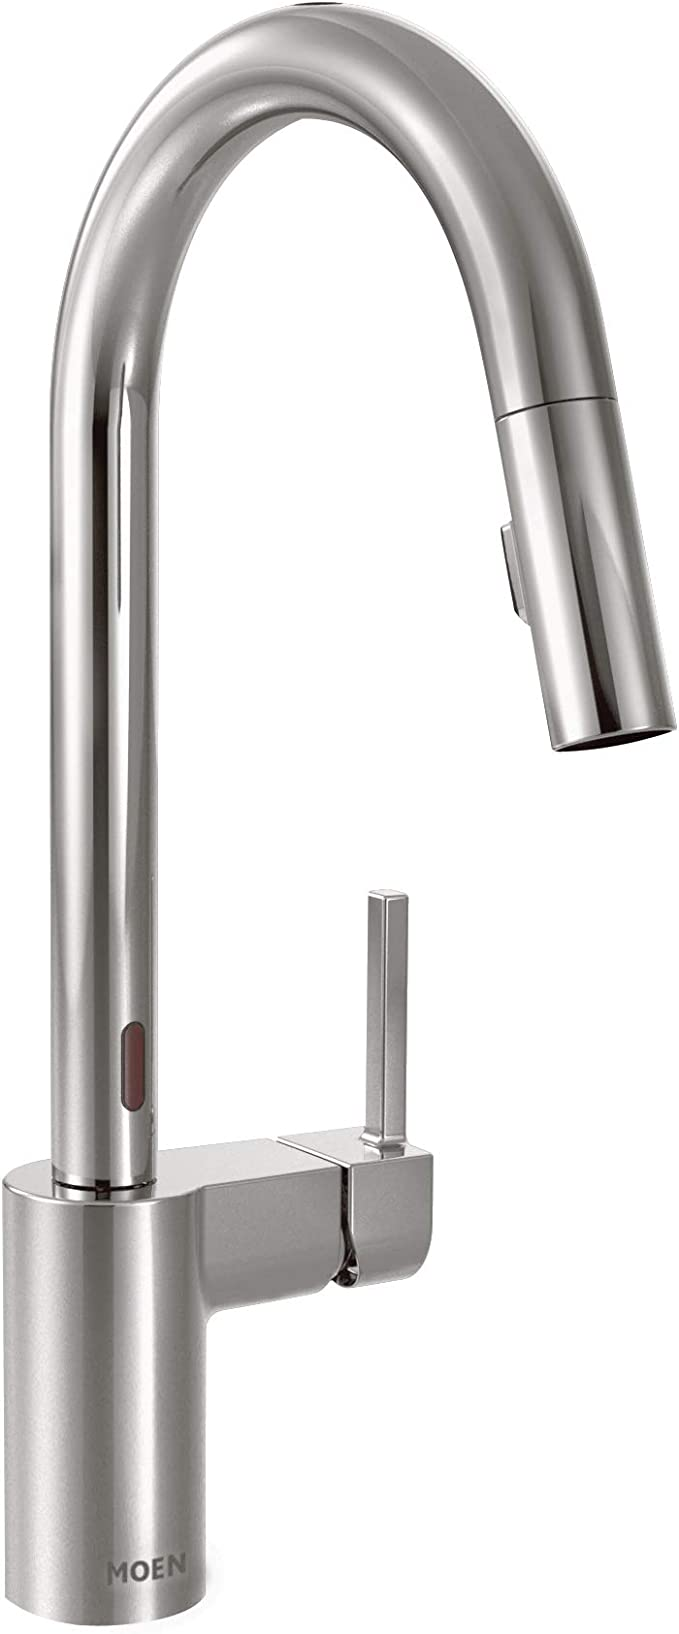 Moen 7565ec Align Motionsense Two Sensor Touchless One Handle High Arc Modern Pulldown Kitchen Faucet With Reflex Chrome Amazon Com